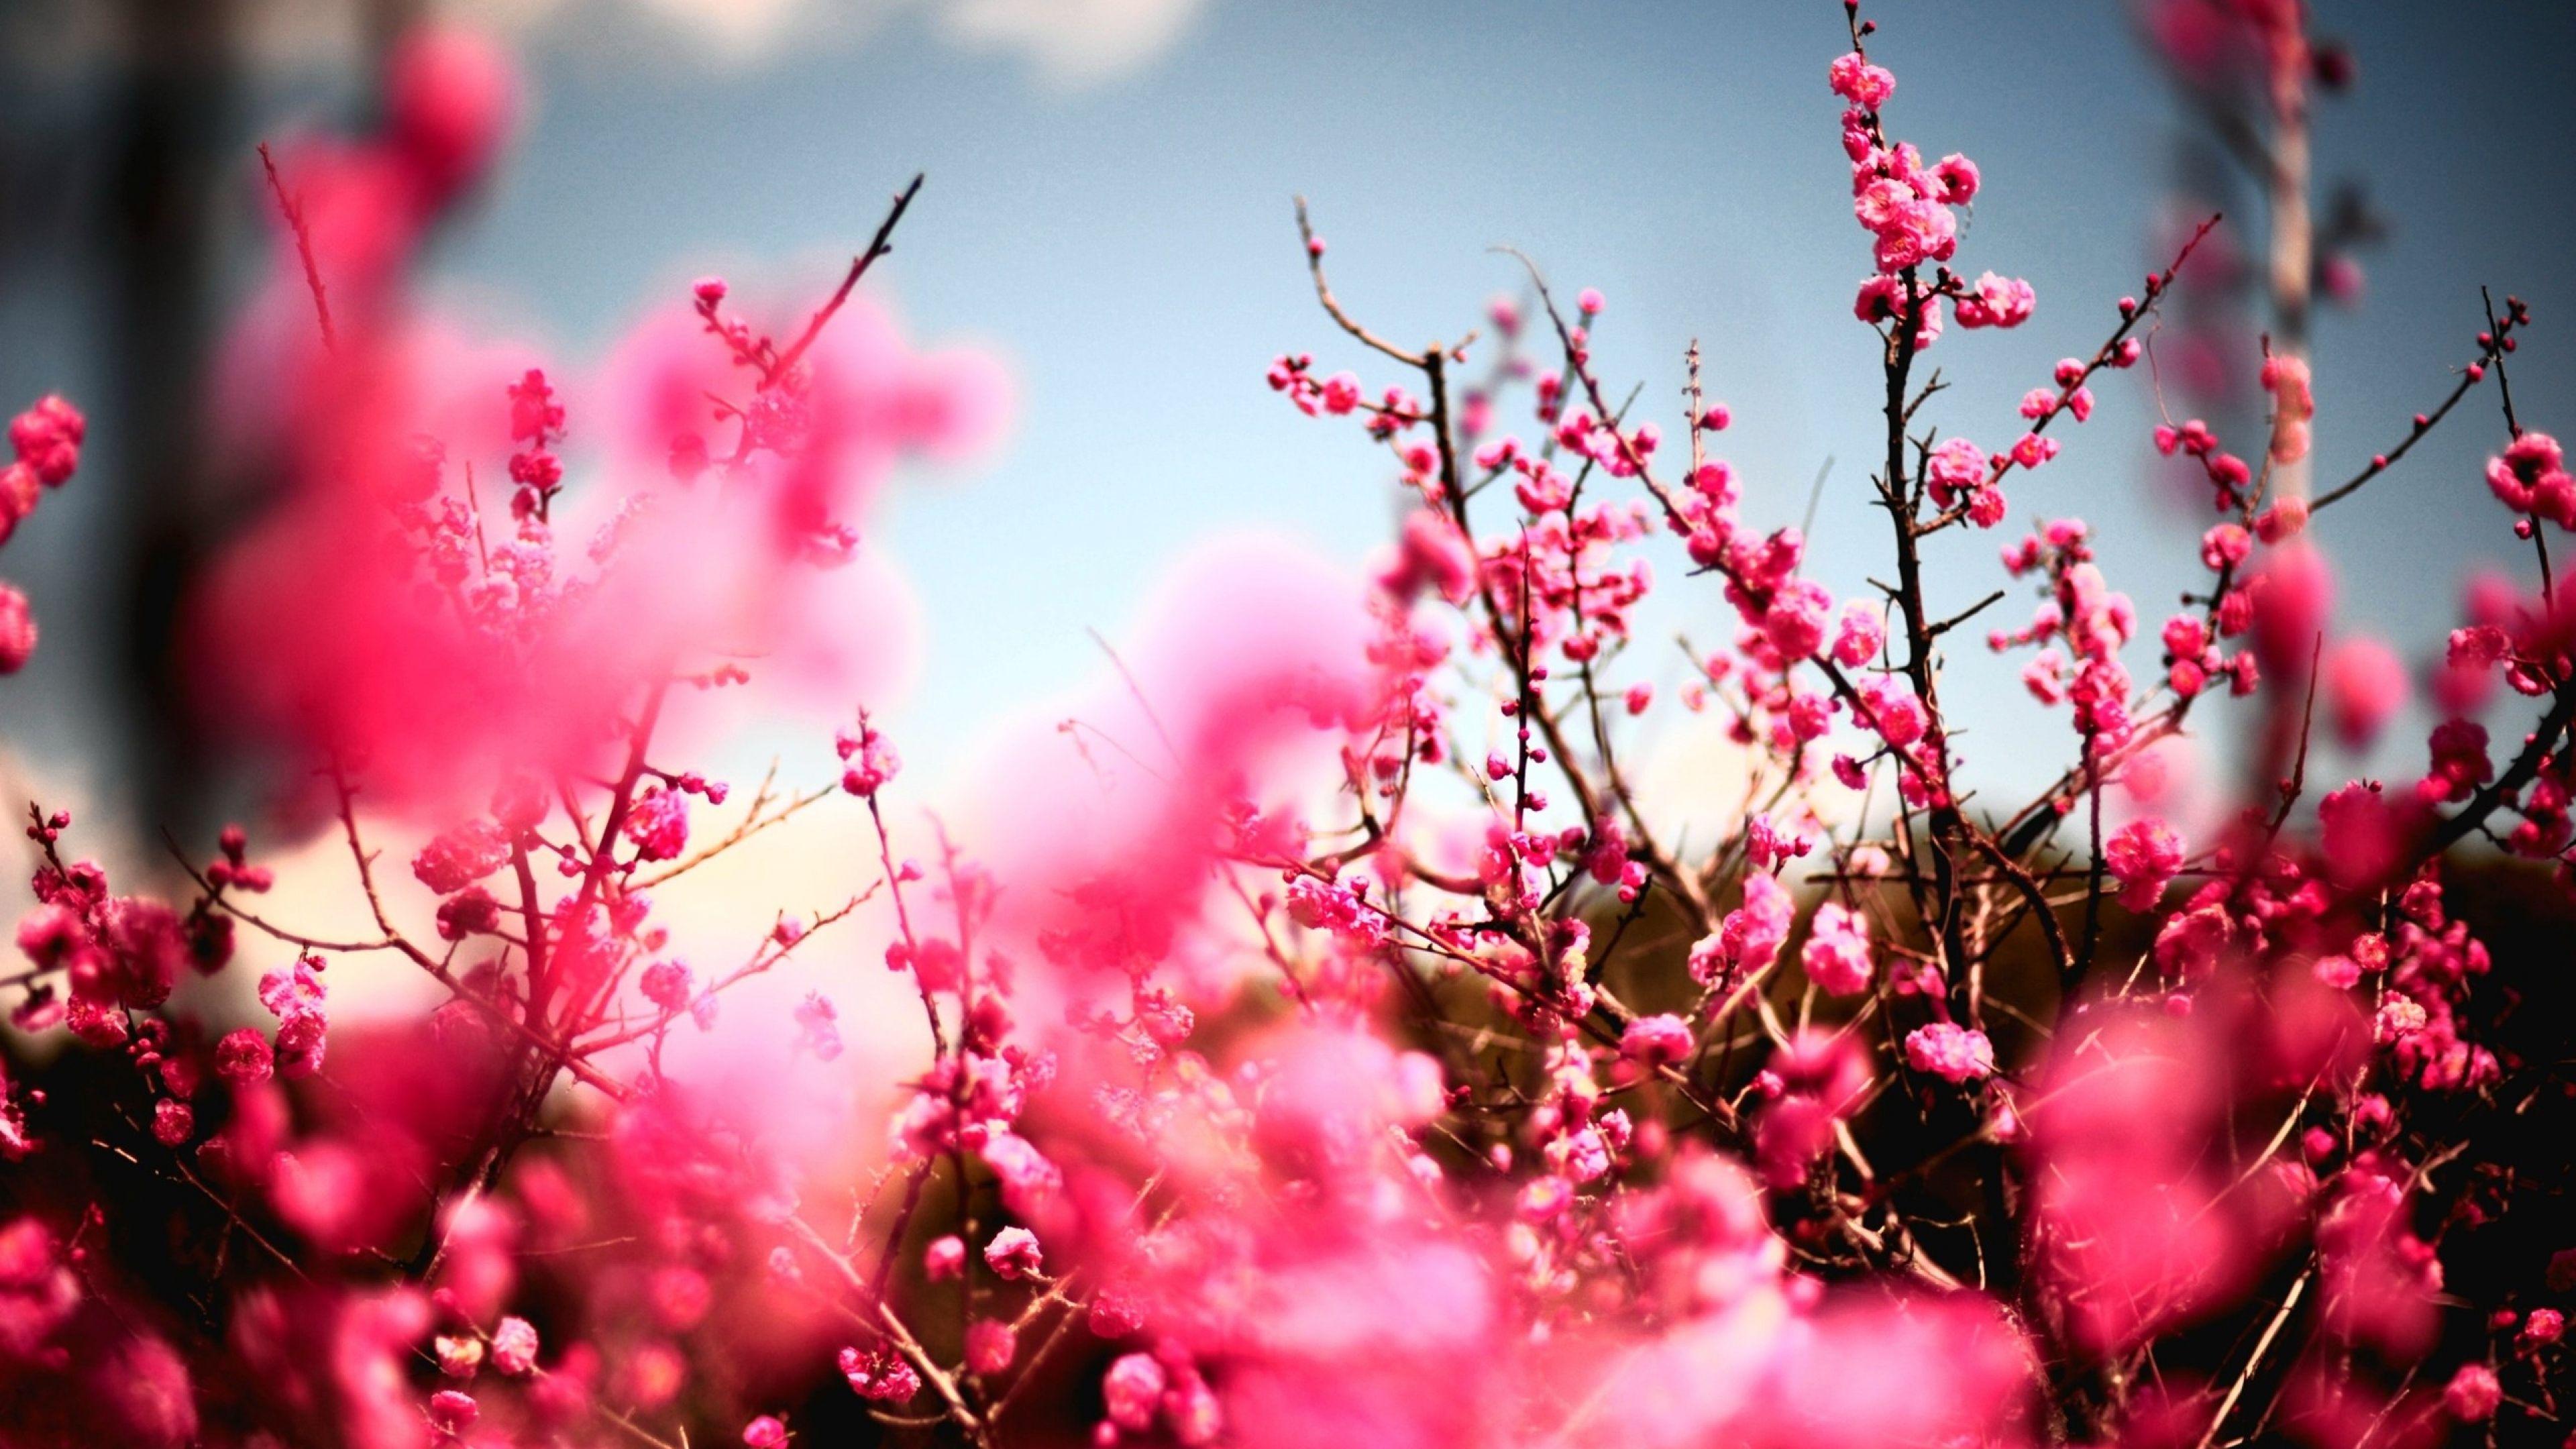 Download Wallpaper 3840x2160 Flowers Sky Nature Beautiful Cherry Blossom Wallpaper Blossom Trees Cherry Blossom Tree